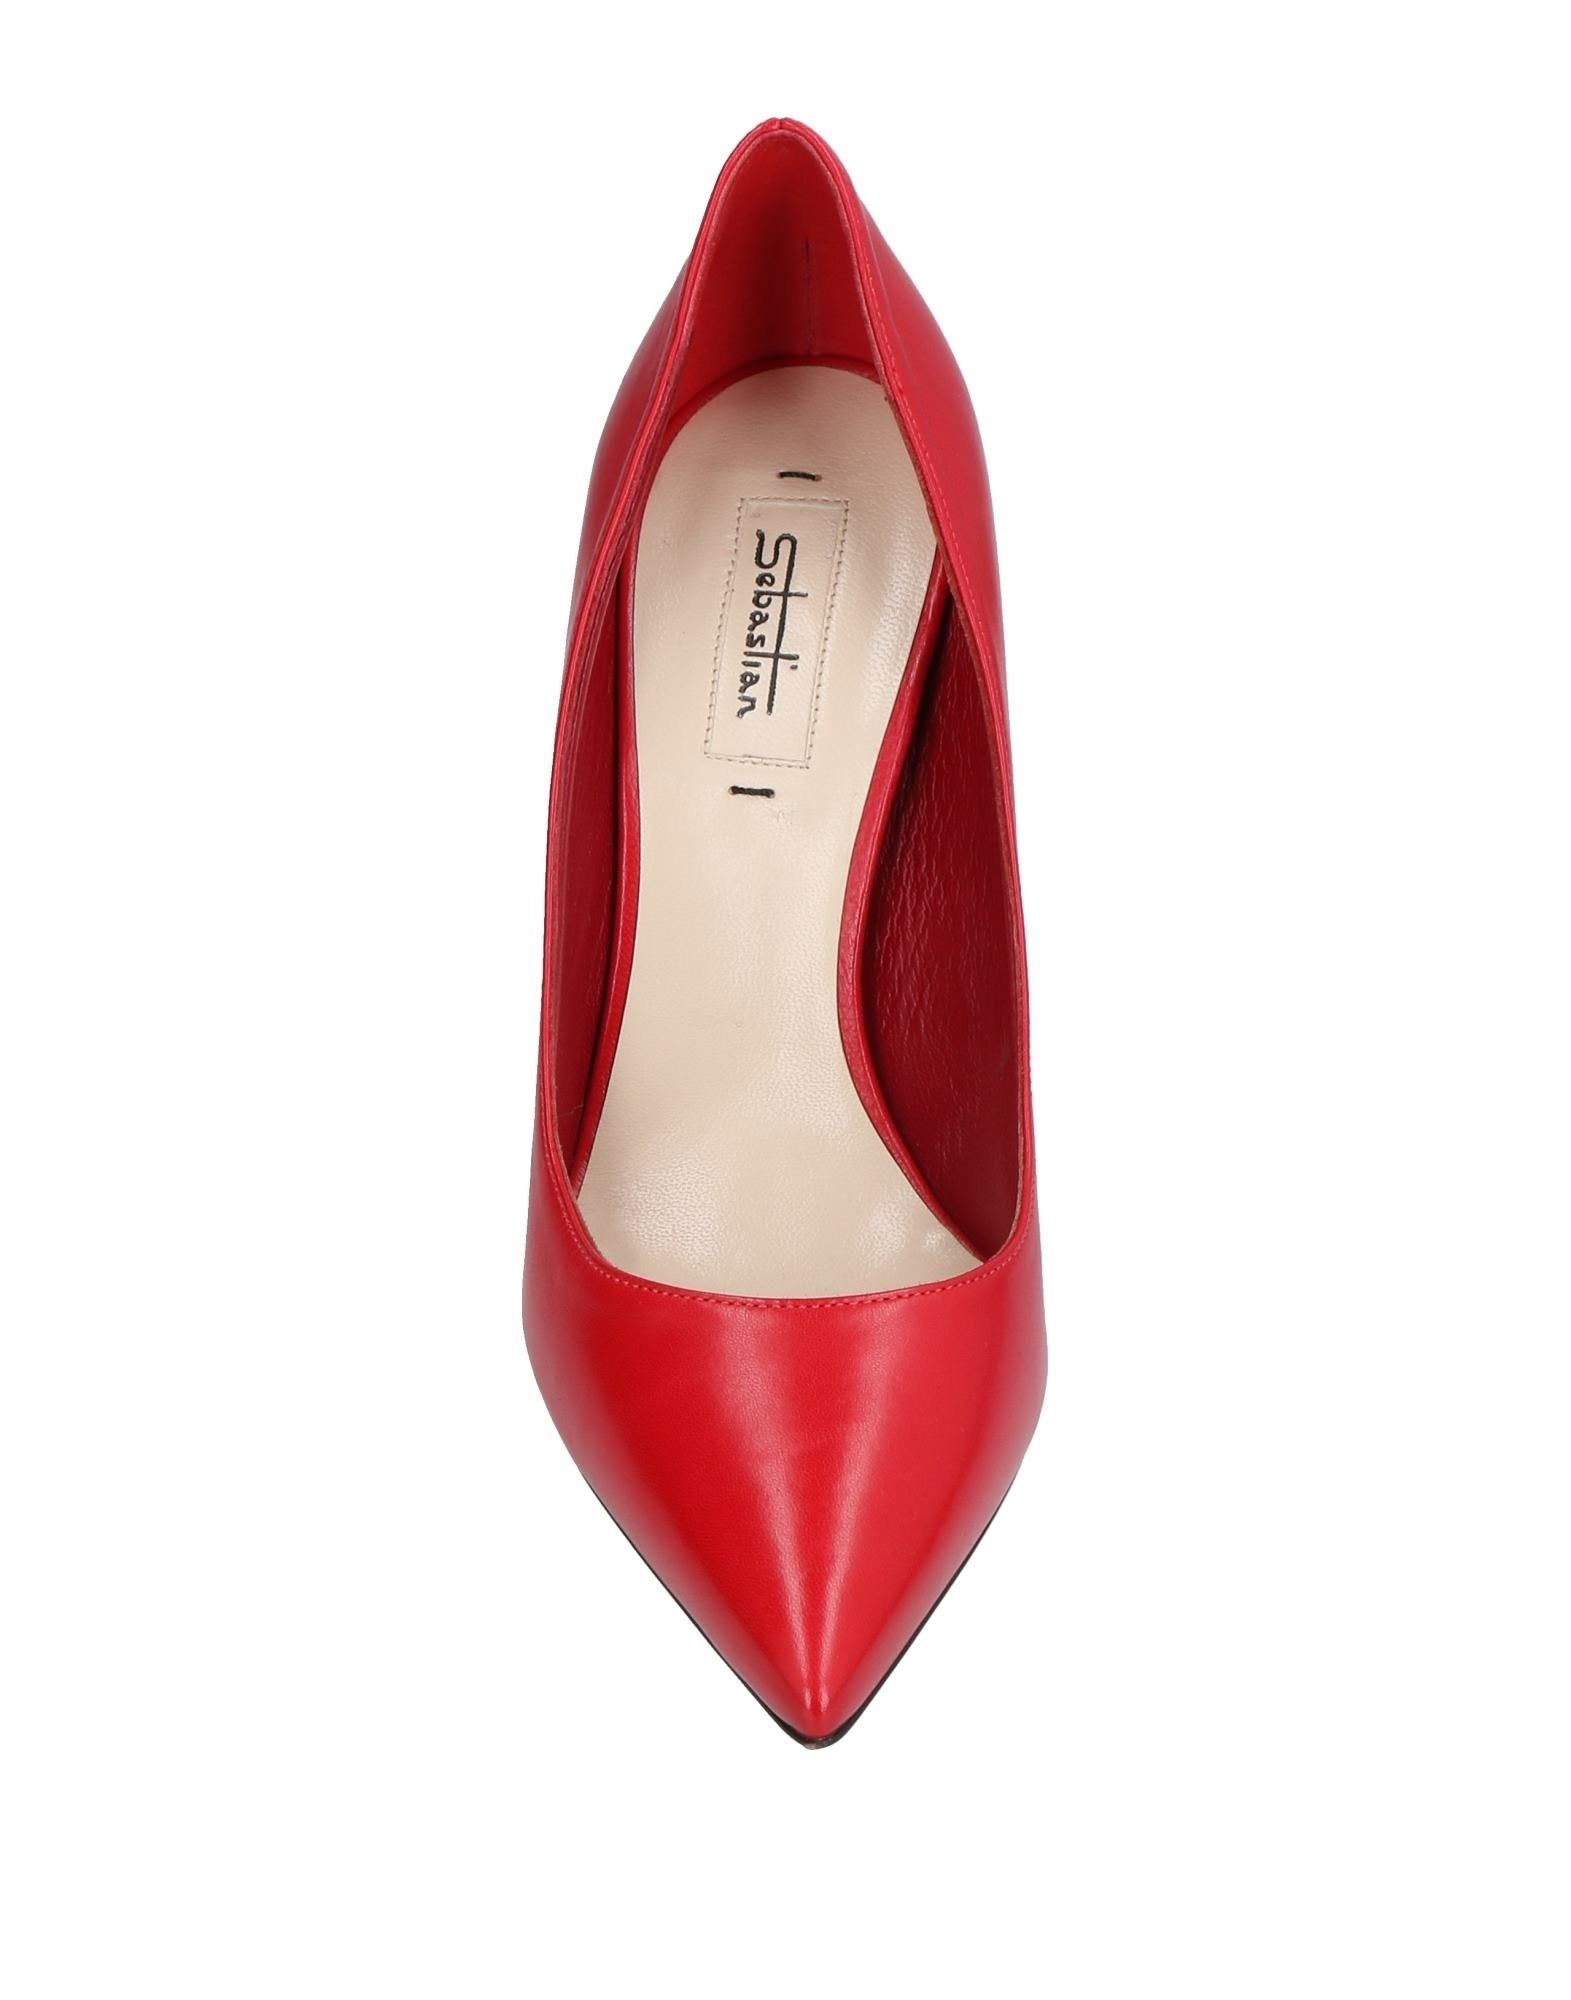 Sebastian Pumps Damen Schuhe  11472213OCGut aussehende strapazierfähige Schuhe Damen 476e29